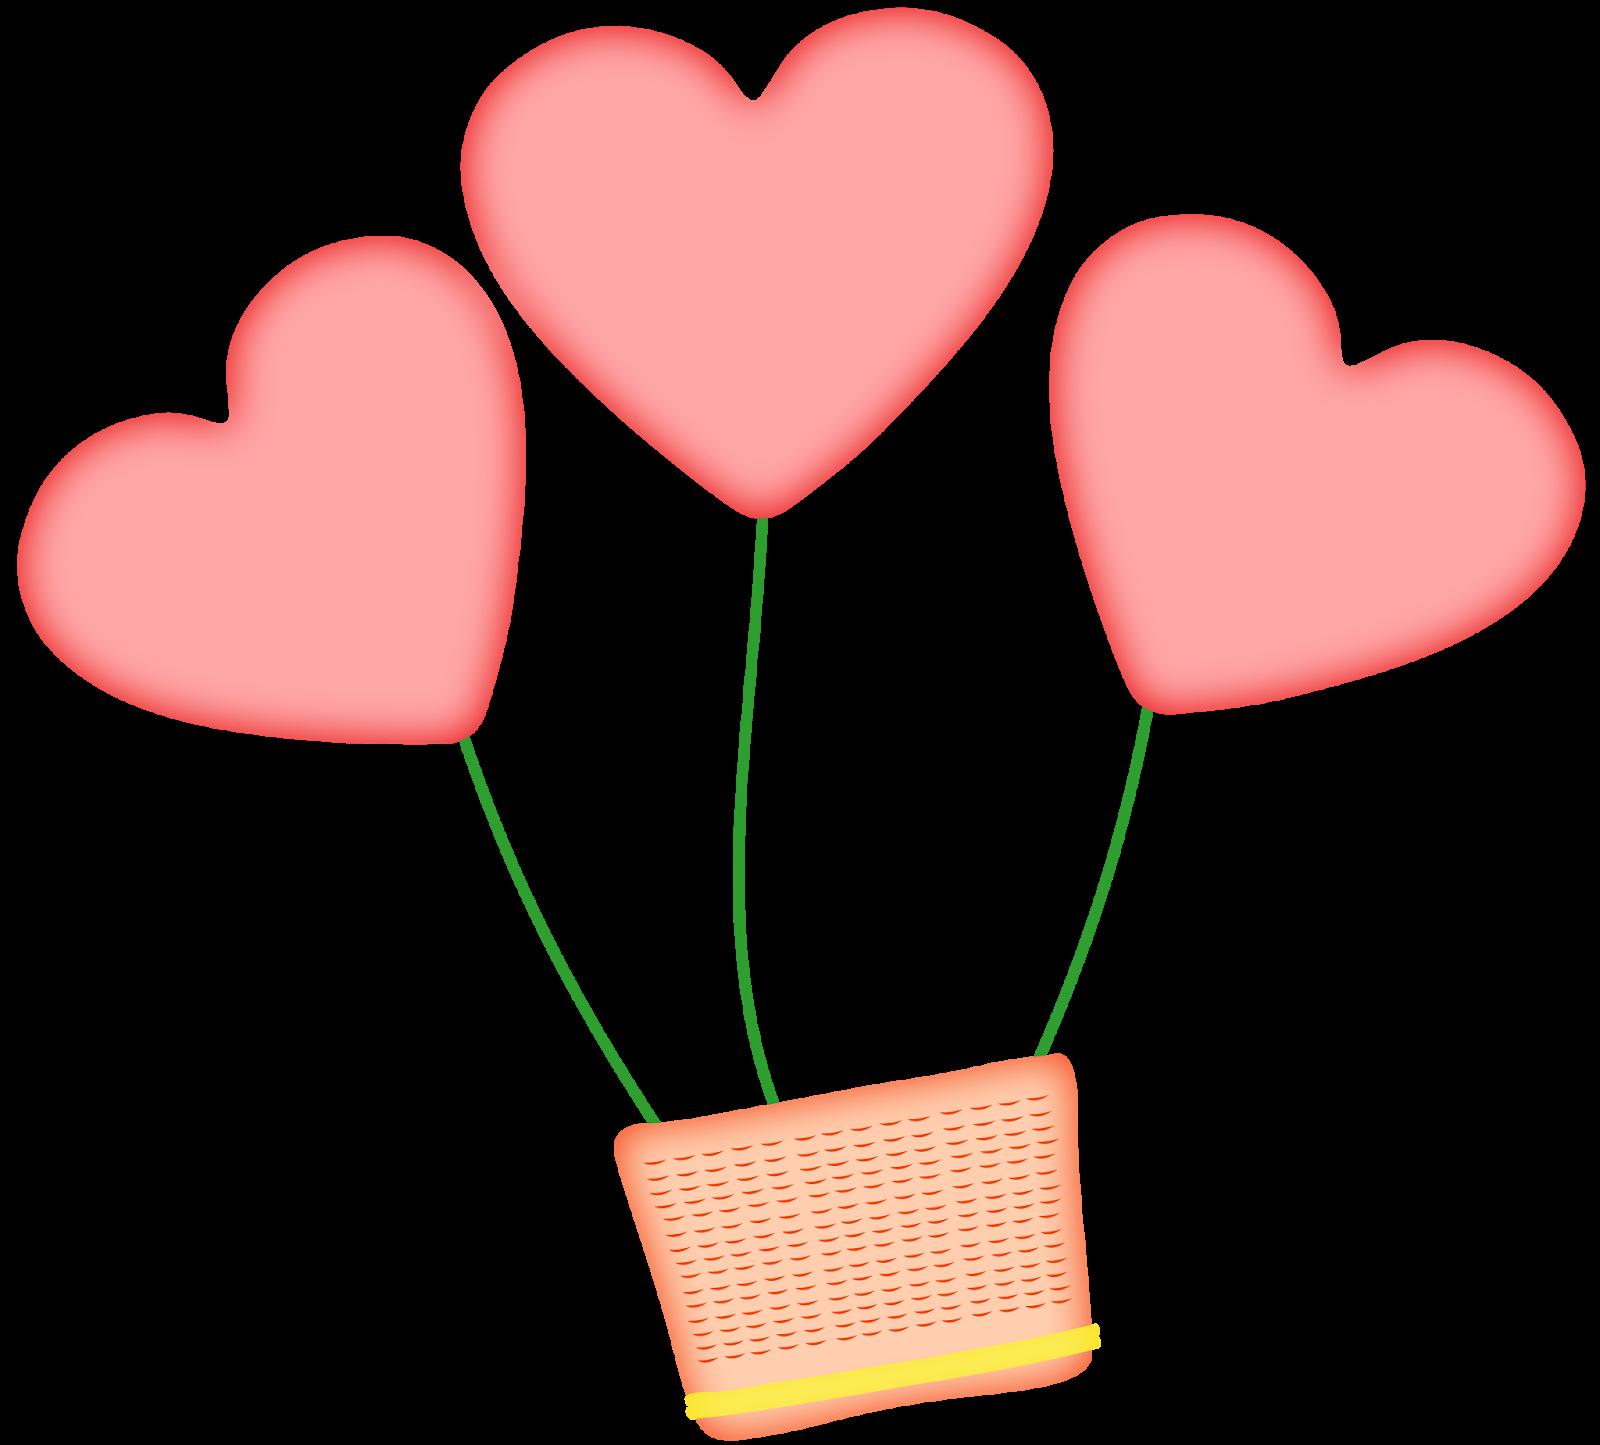 Hearts clipart garden. Enchanted oh my fiesta